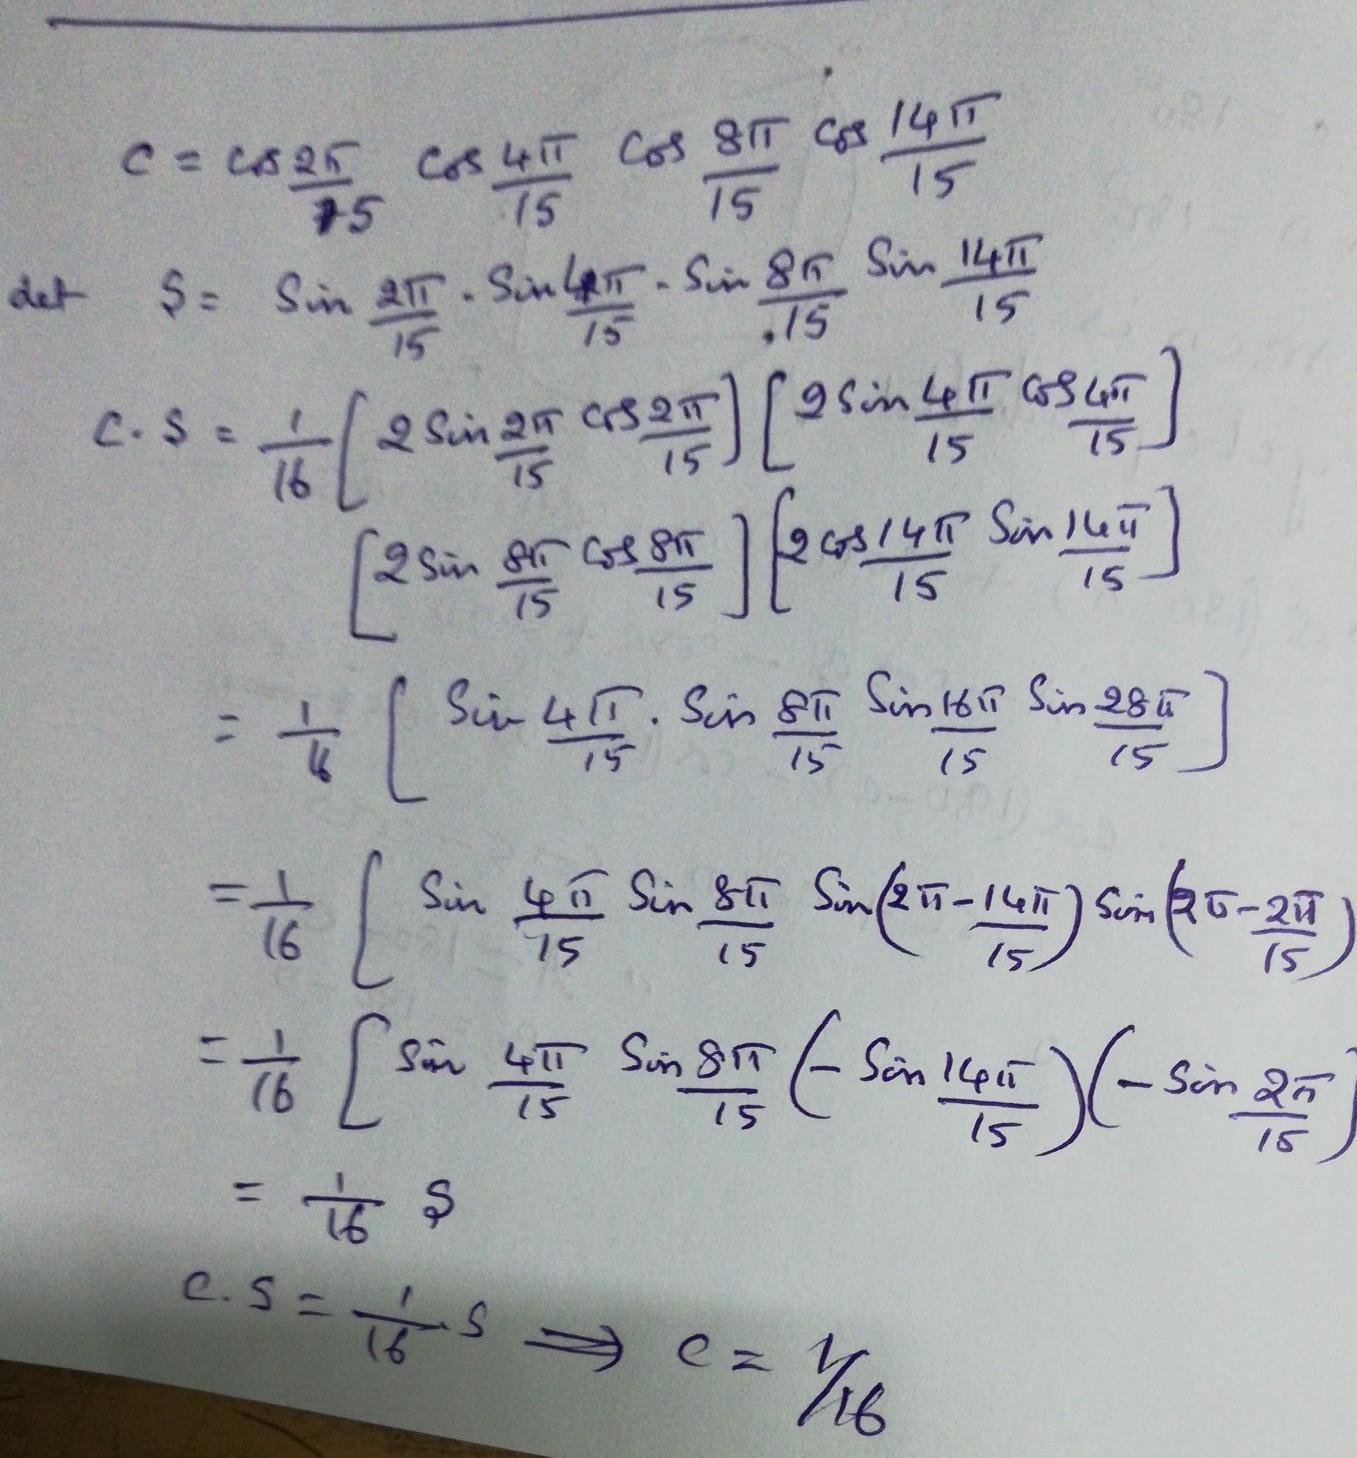 Prove That Cos 2pi 15 Cos 4pi 15 Cos 8pi 15 Cos 14pi 15 1 16 Brainly In